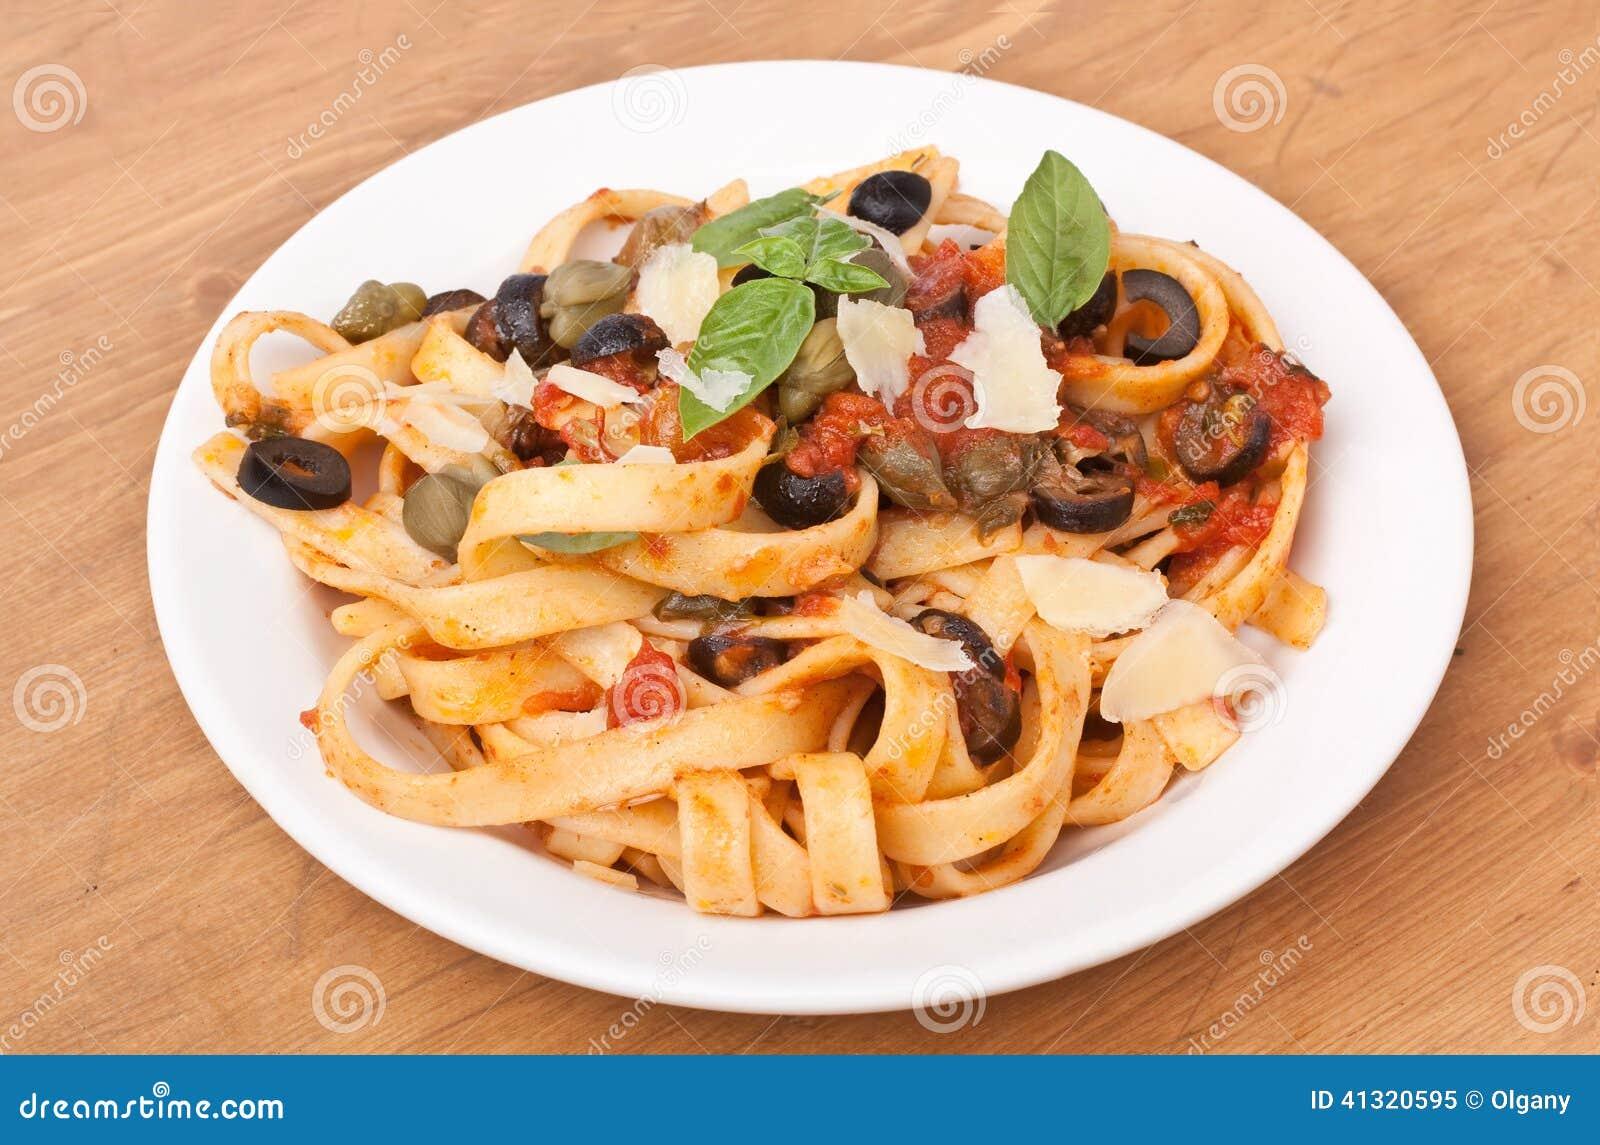 "Spaghetti"" With Tomato Sauce And Parmesan Cheese Recipes — Dishmaps"